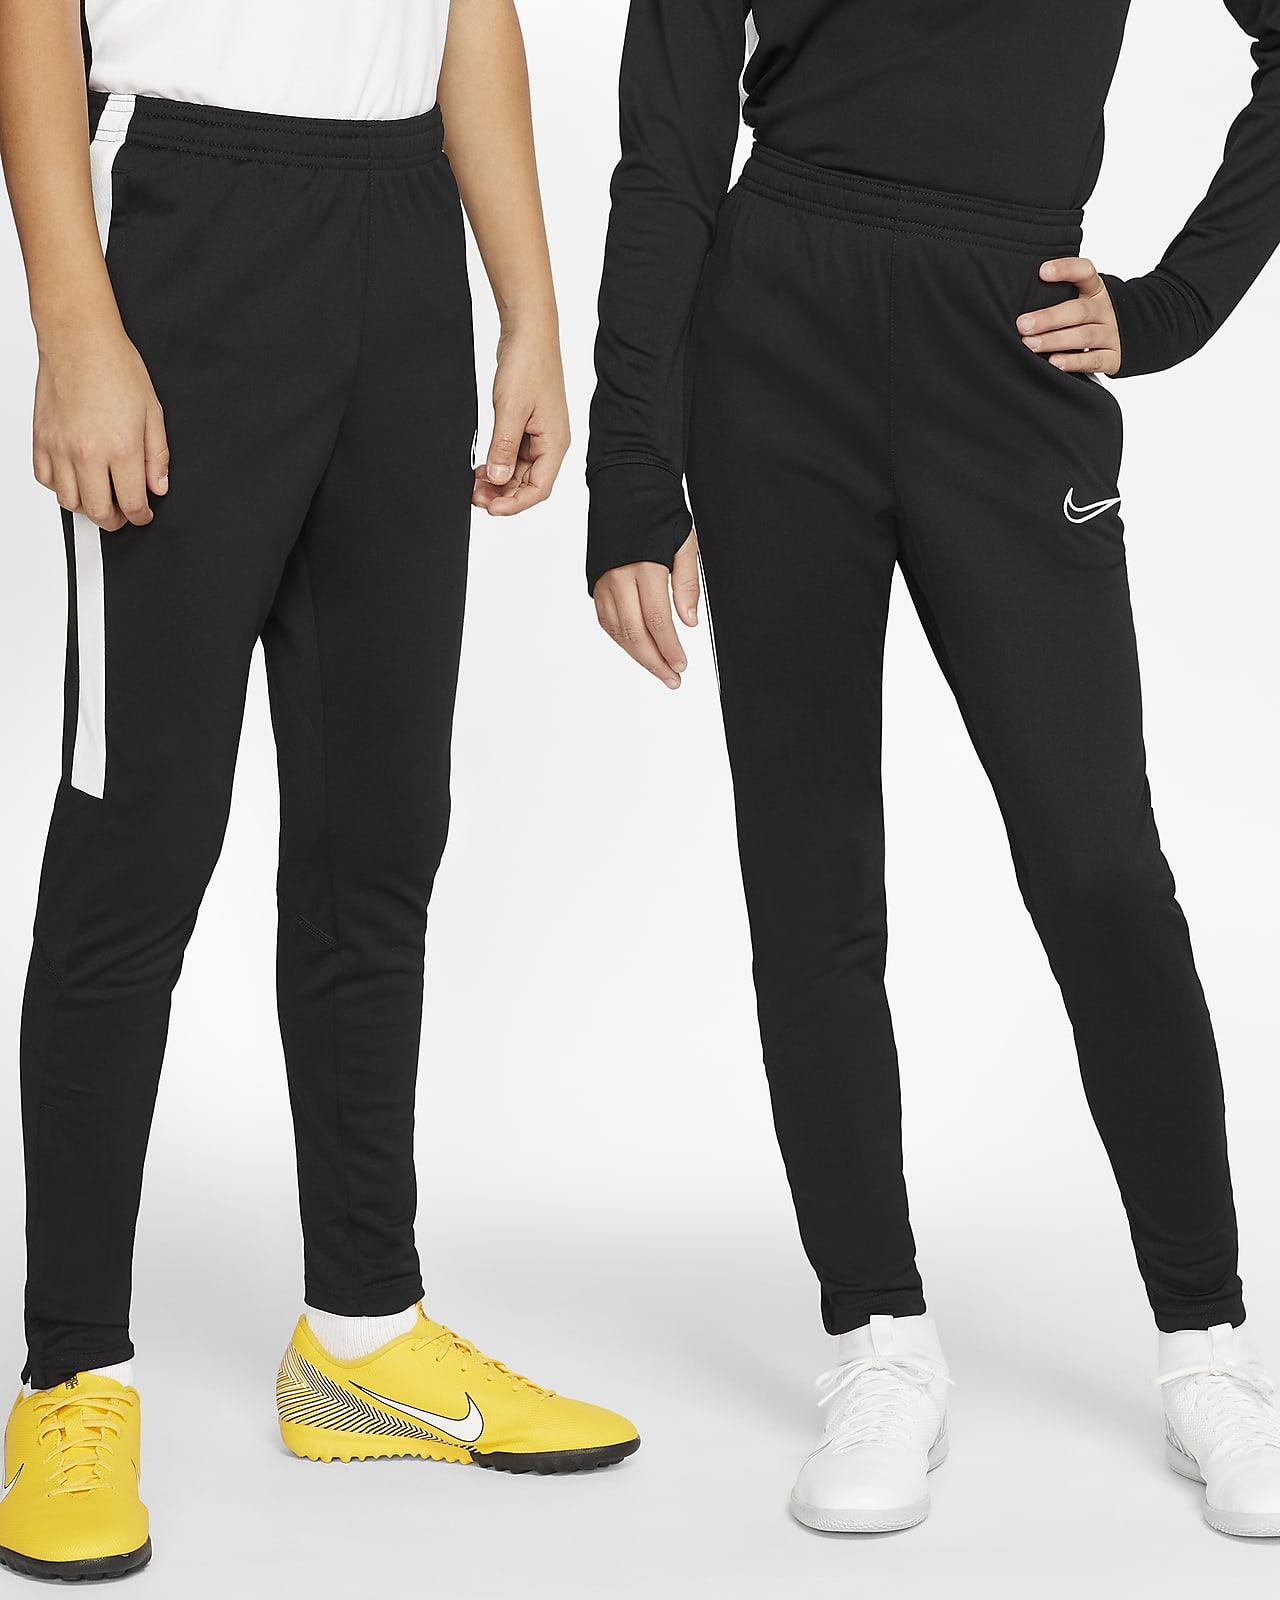 Nike Dri-FIT Academy大童(男孩)足球长裤